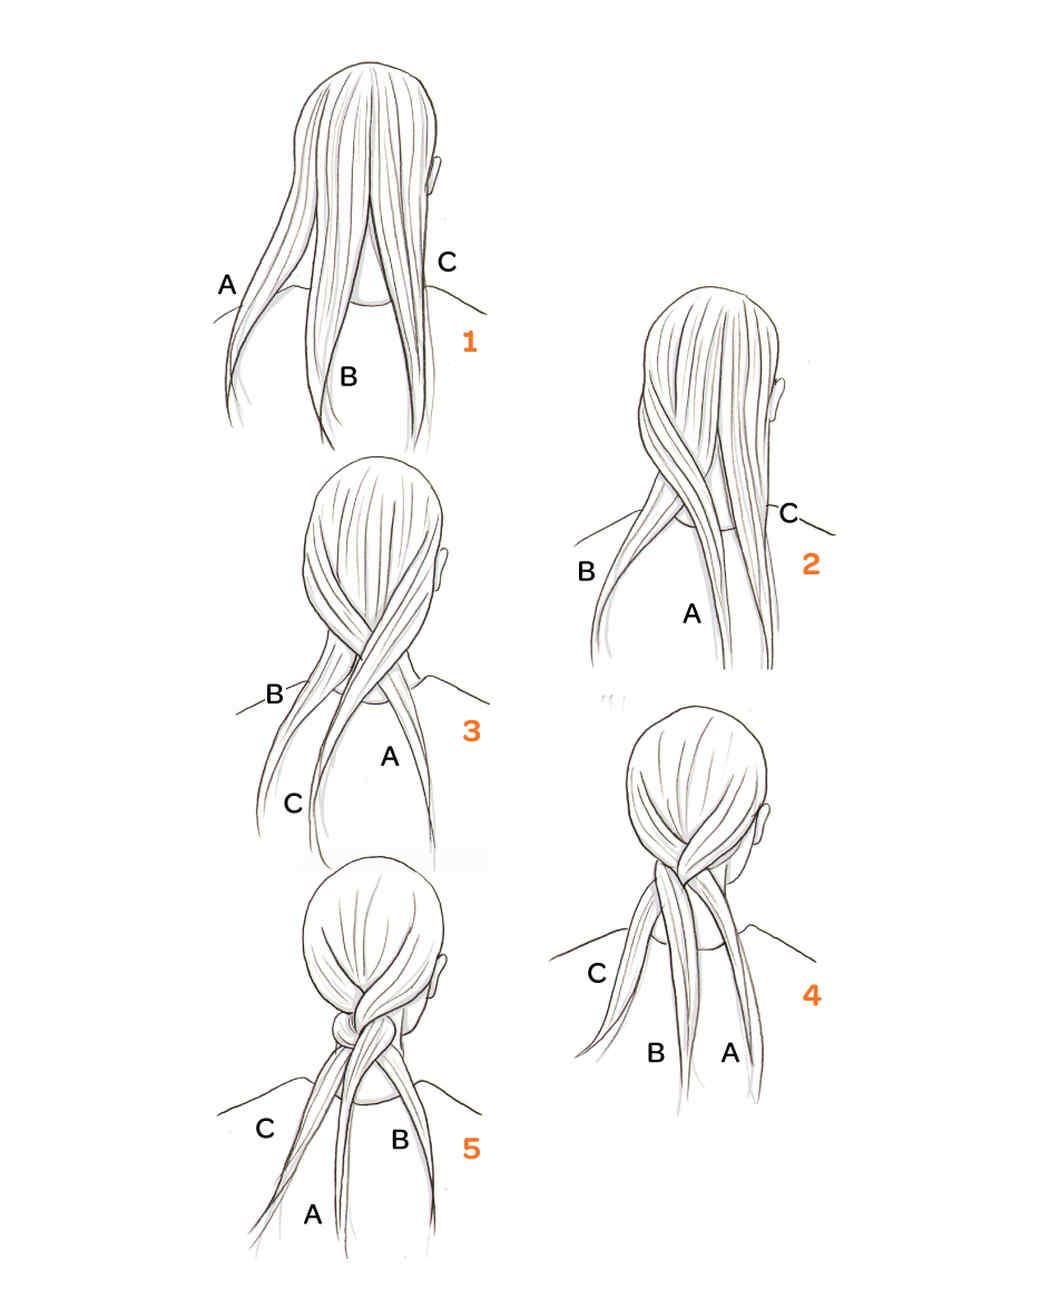 braids-regular-braid-illustration-mi108987.jpg